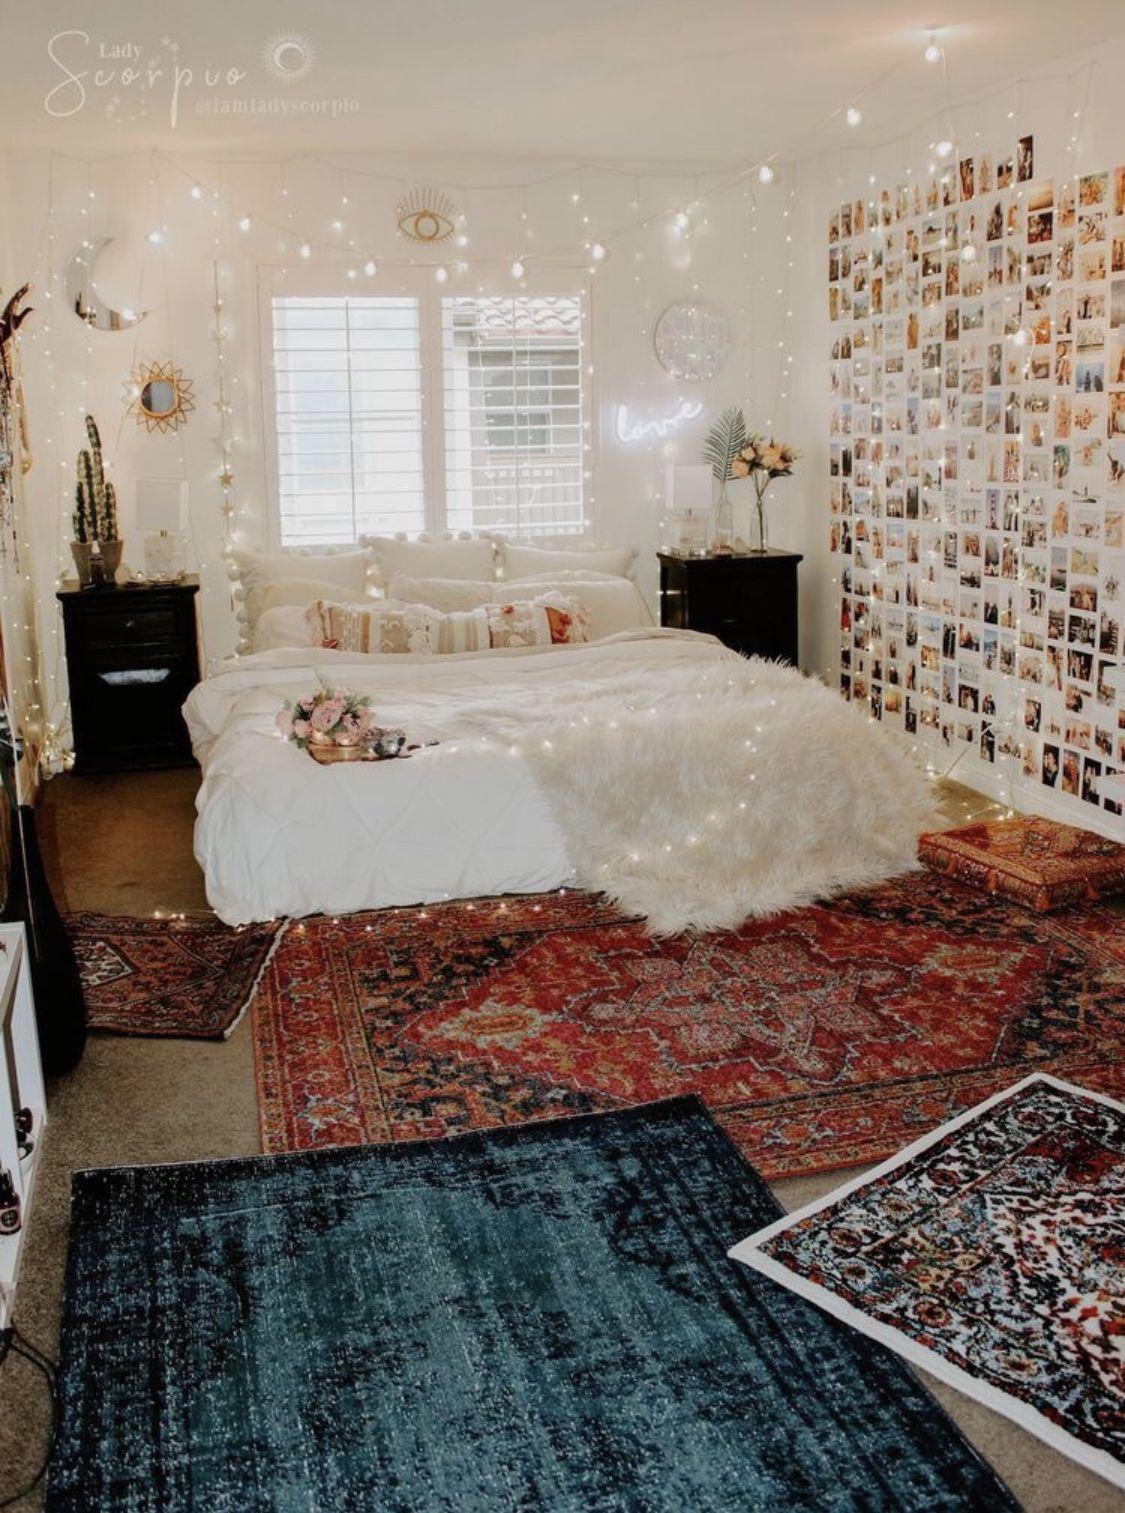 Pin By Ewa Ka On Room Decorstions Bedroom Makeover Room Decor Small Room Bedroom